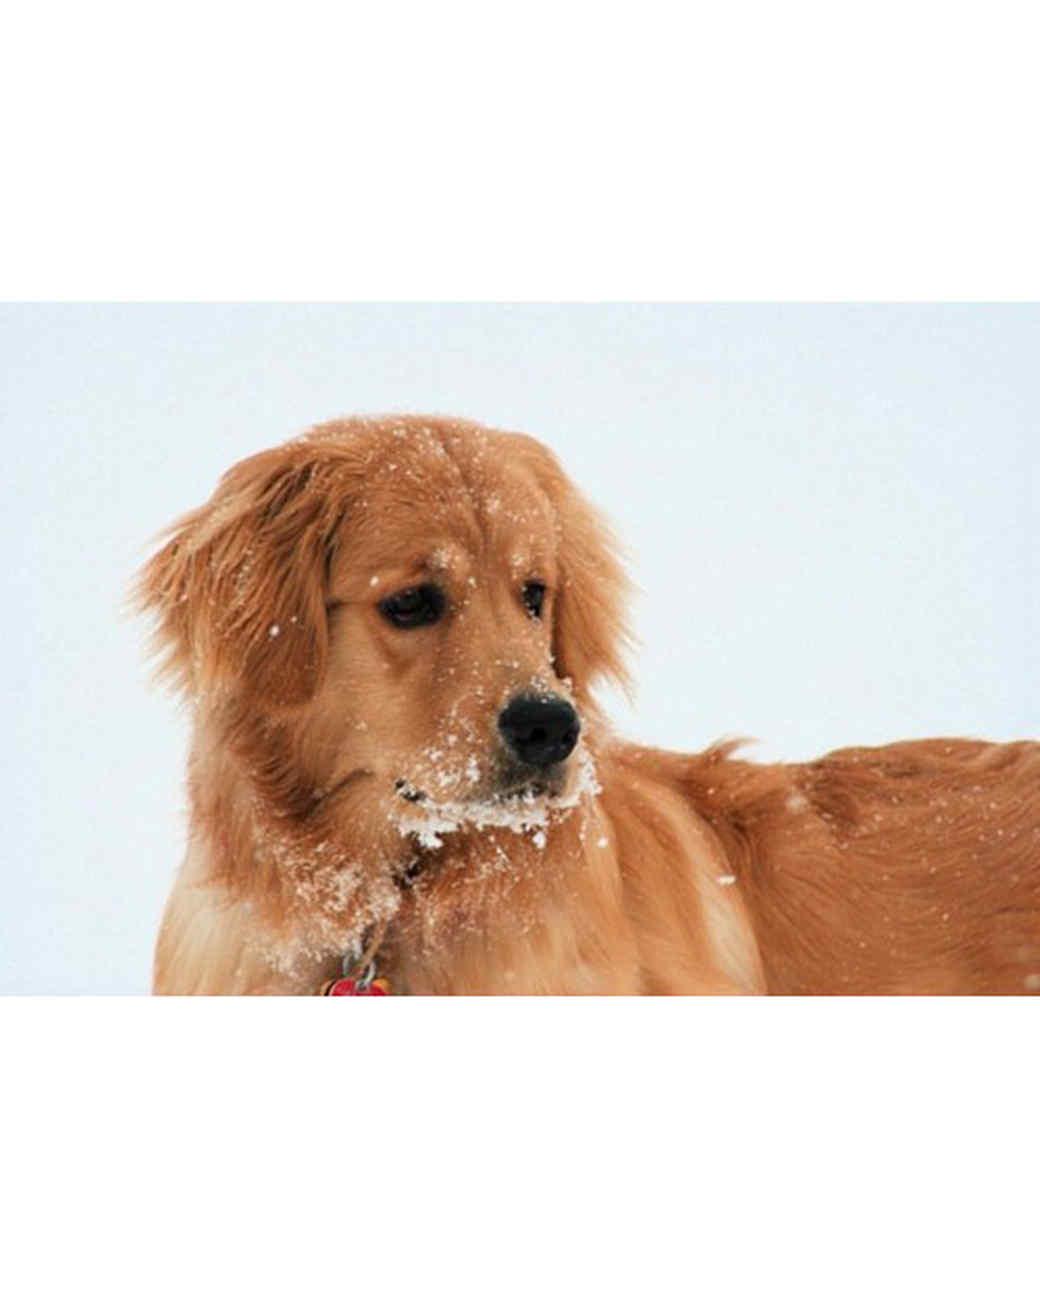 pets_snowangels_7278326_122717_19188896.jpg